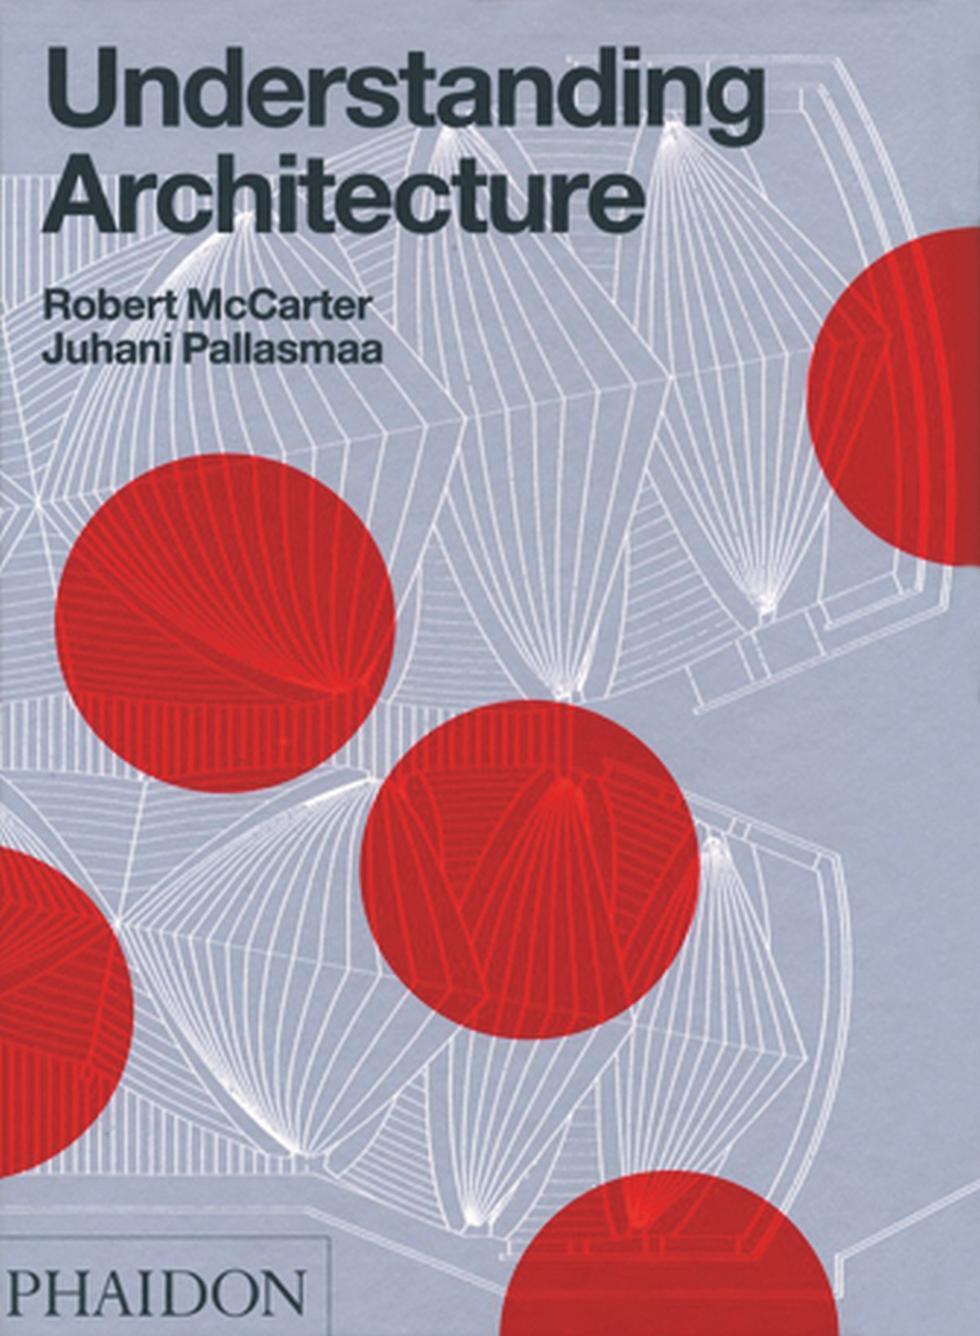 Robert McCarter, Juhani Pallasmaa, Understanding Architecture